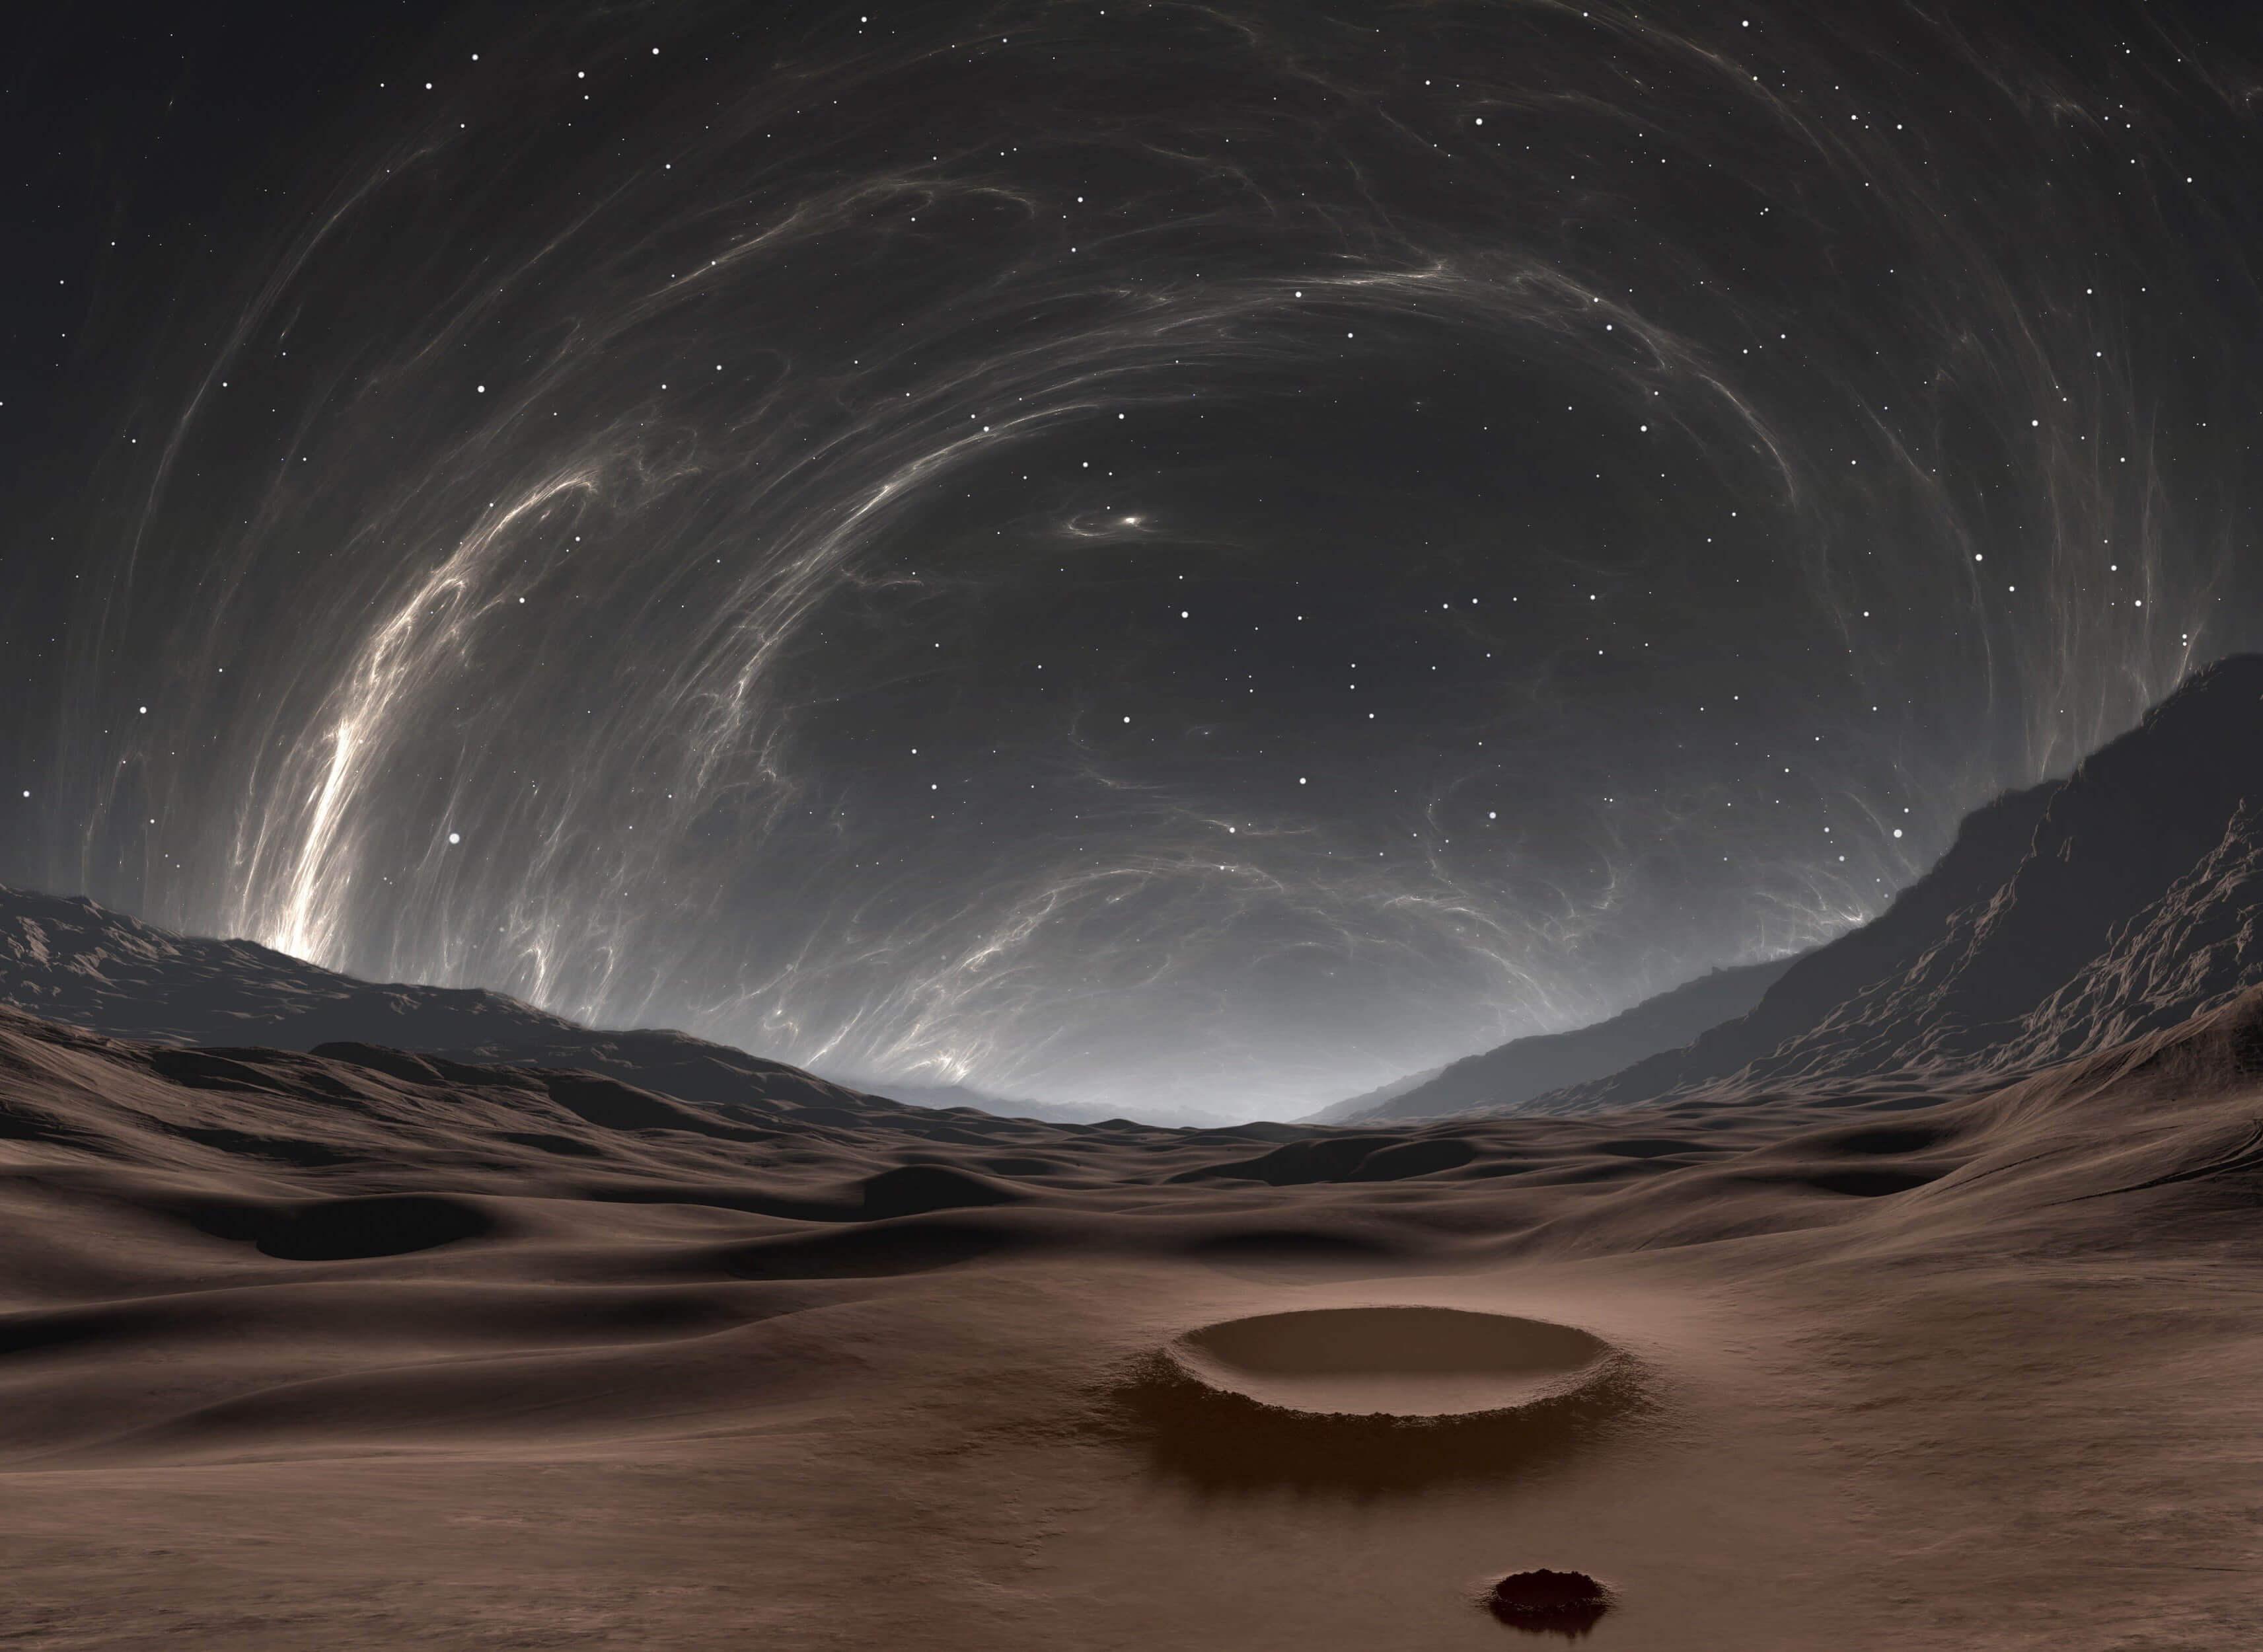 Odpověď na Fermiho paradox? Virtuální realita!